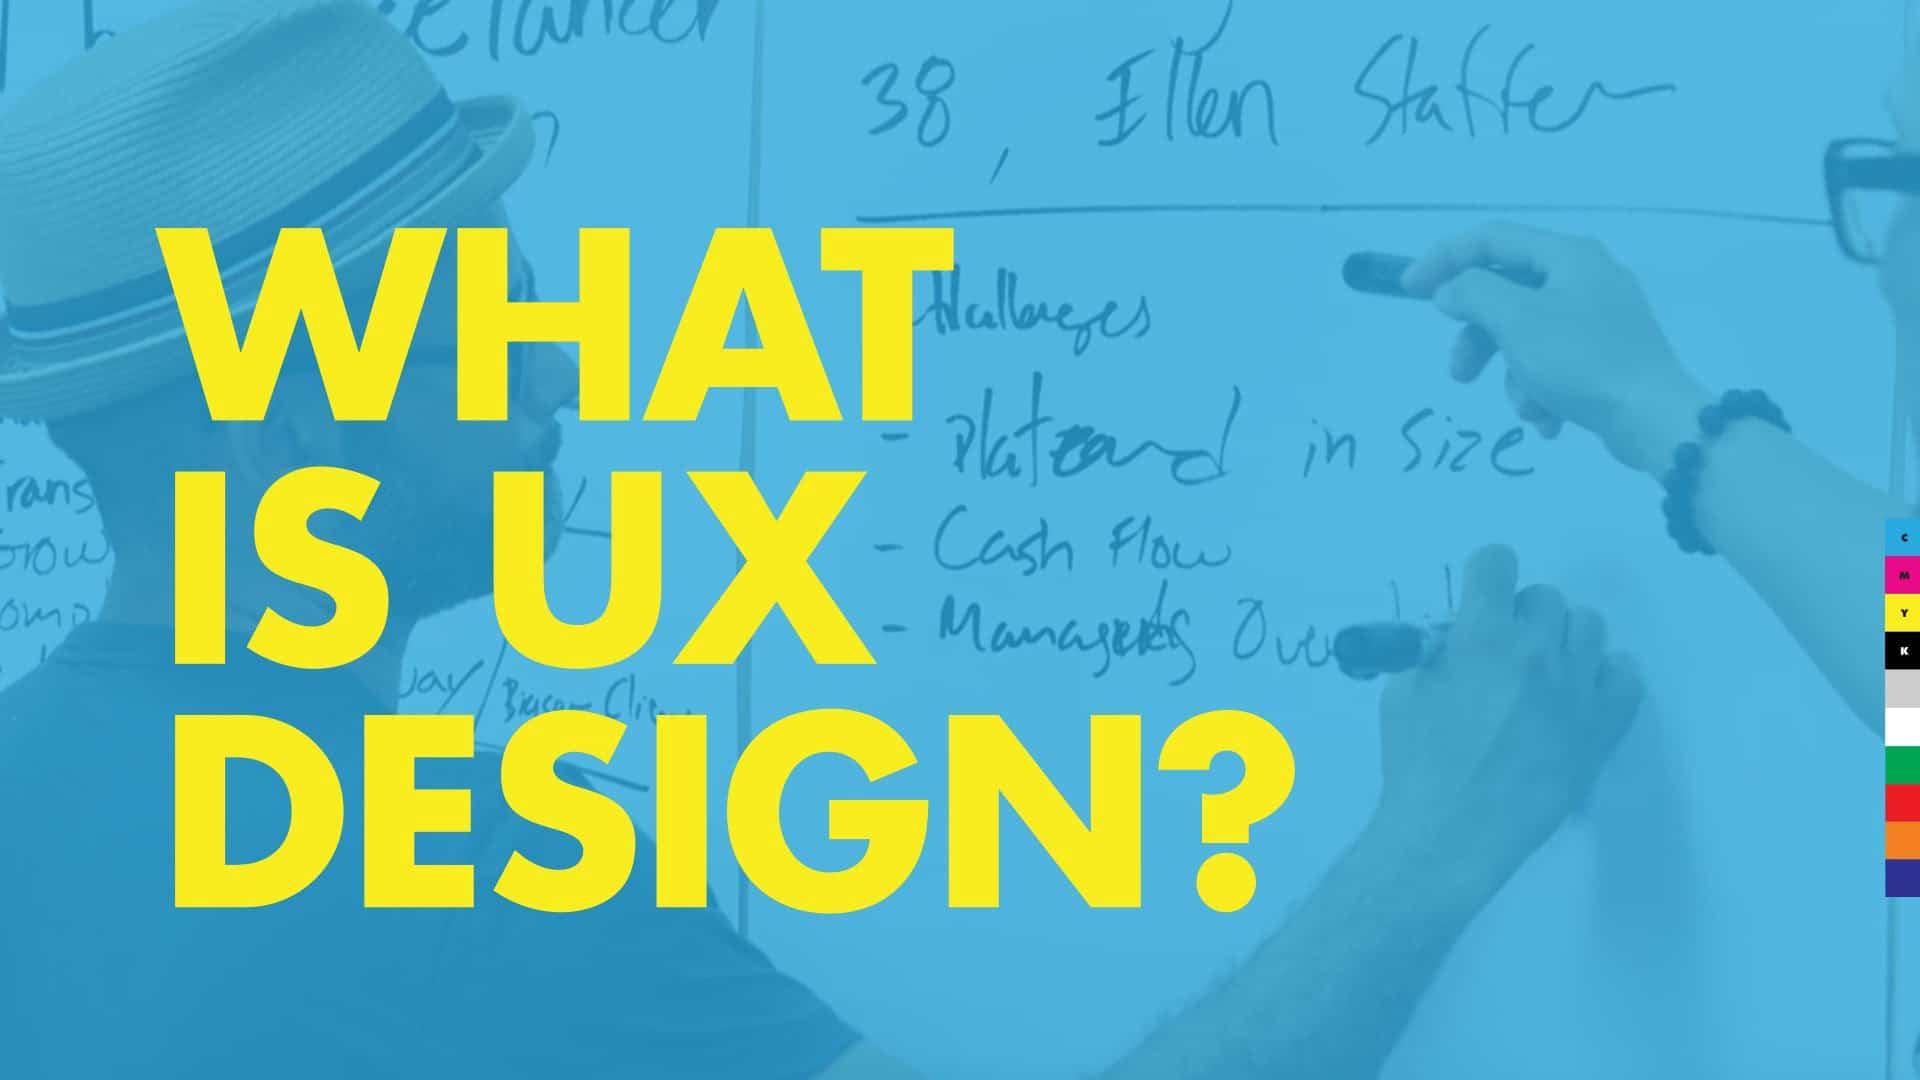 UX چیست؟ 5 اصول اصلی تجربه کاربری برای وبسایتها